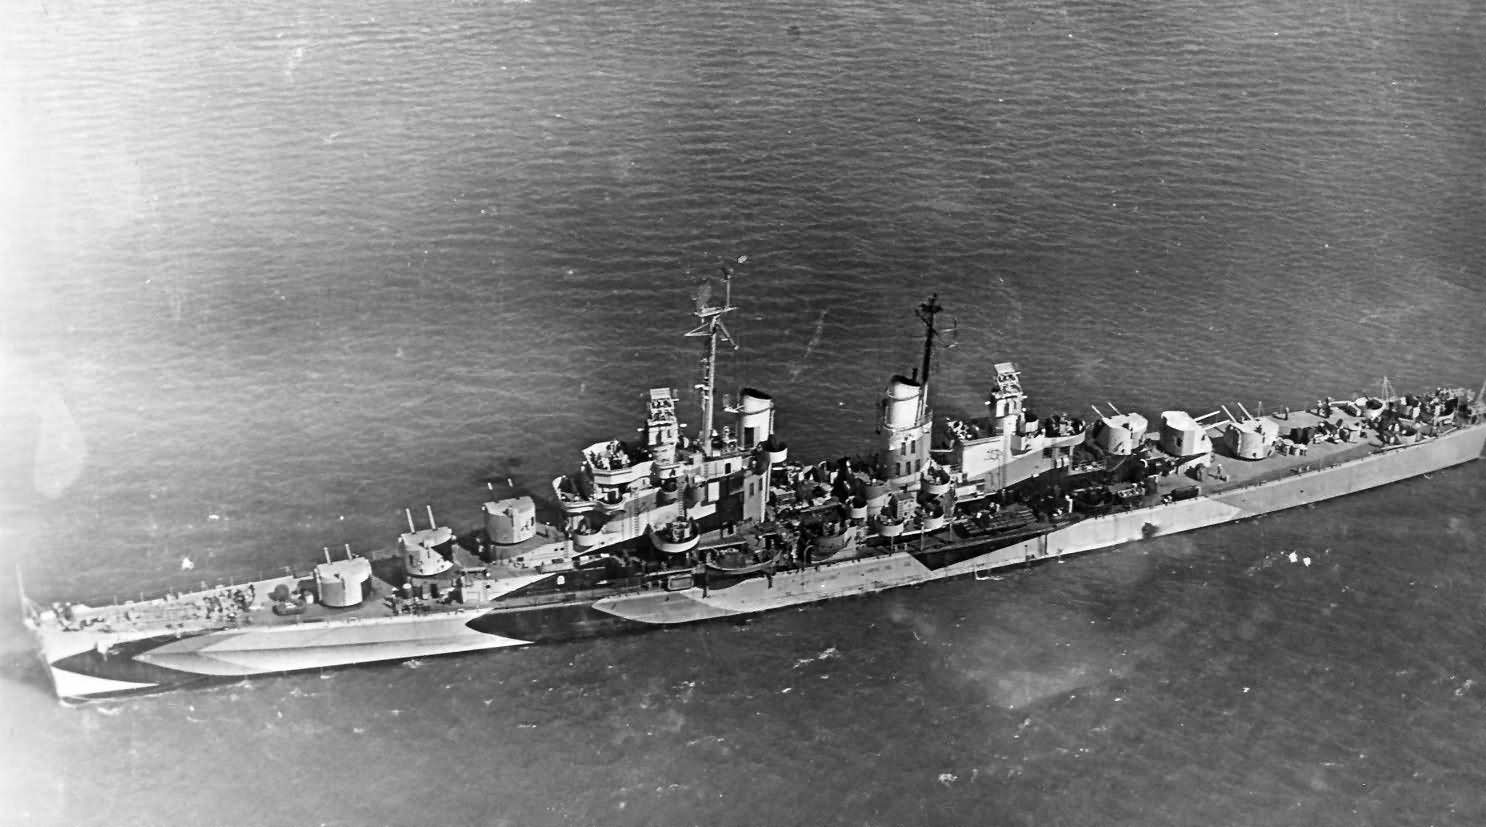 USS Flint (CL-97) US Navy Light Cruiser in camouflage